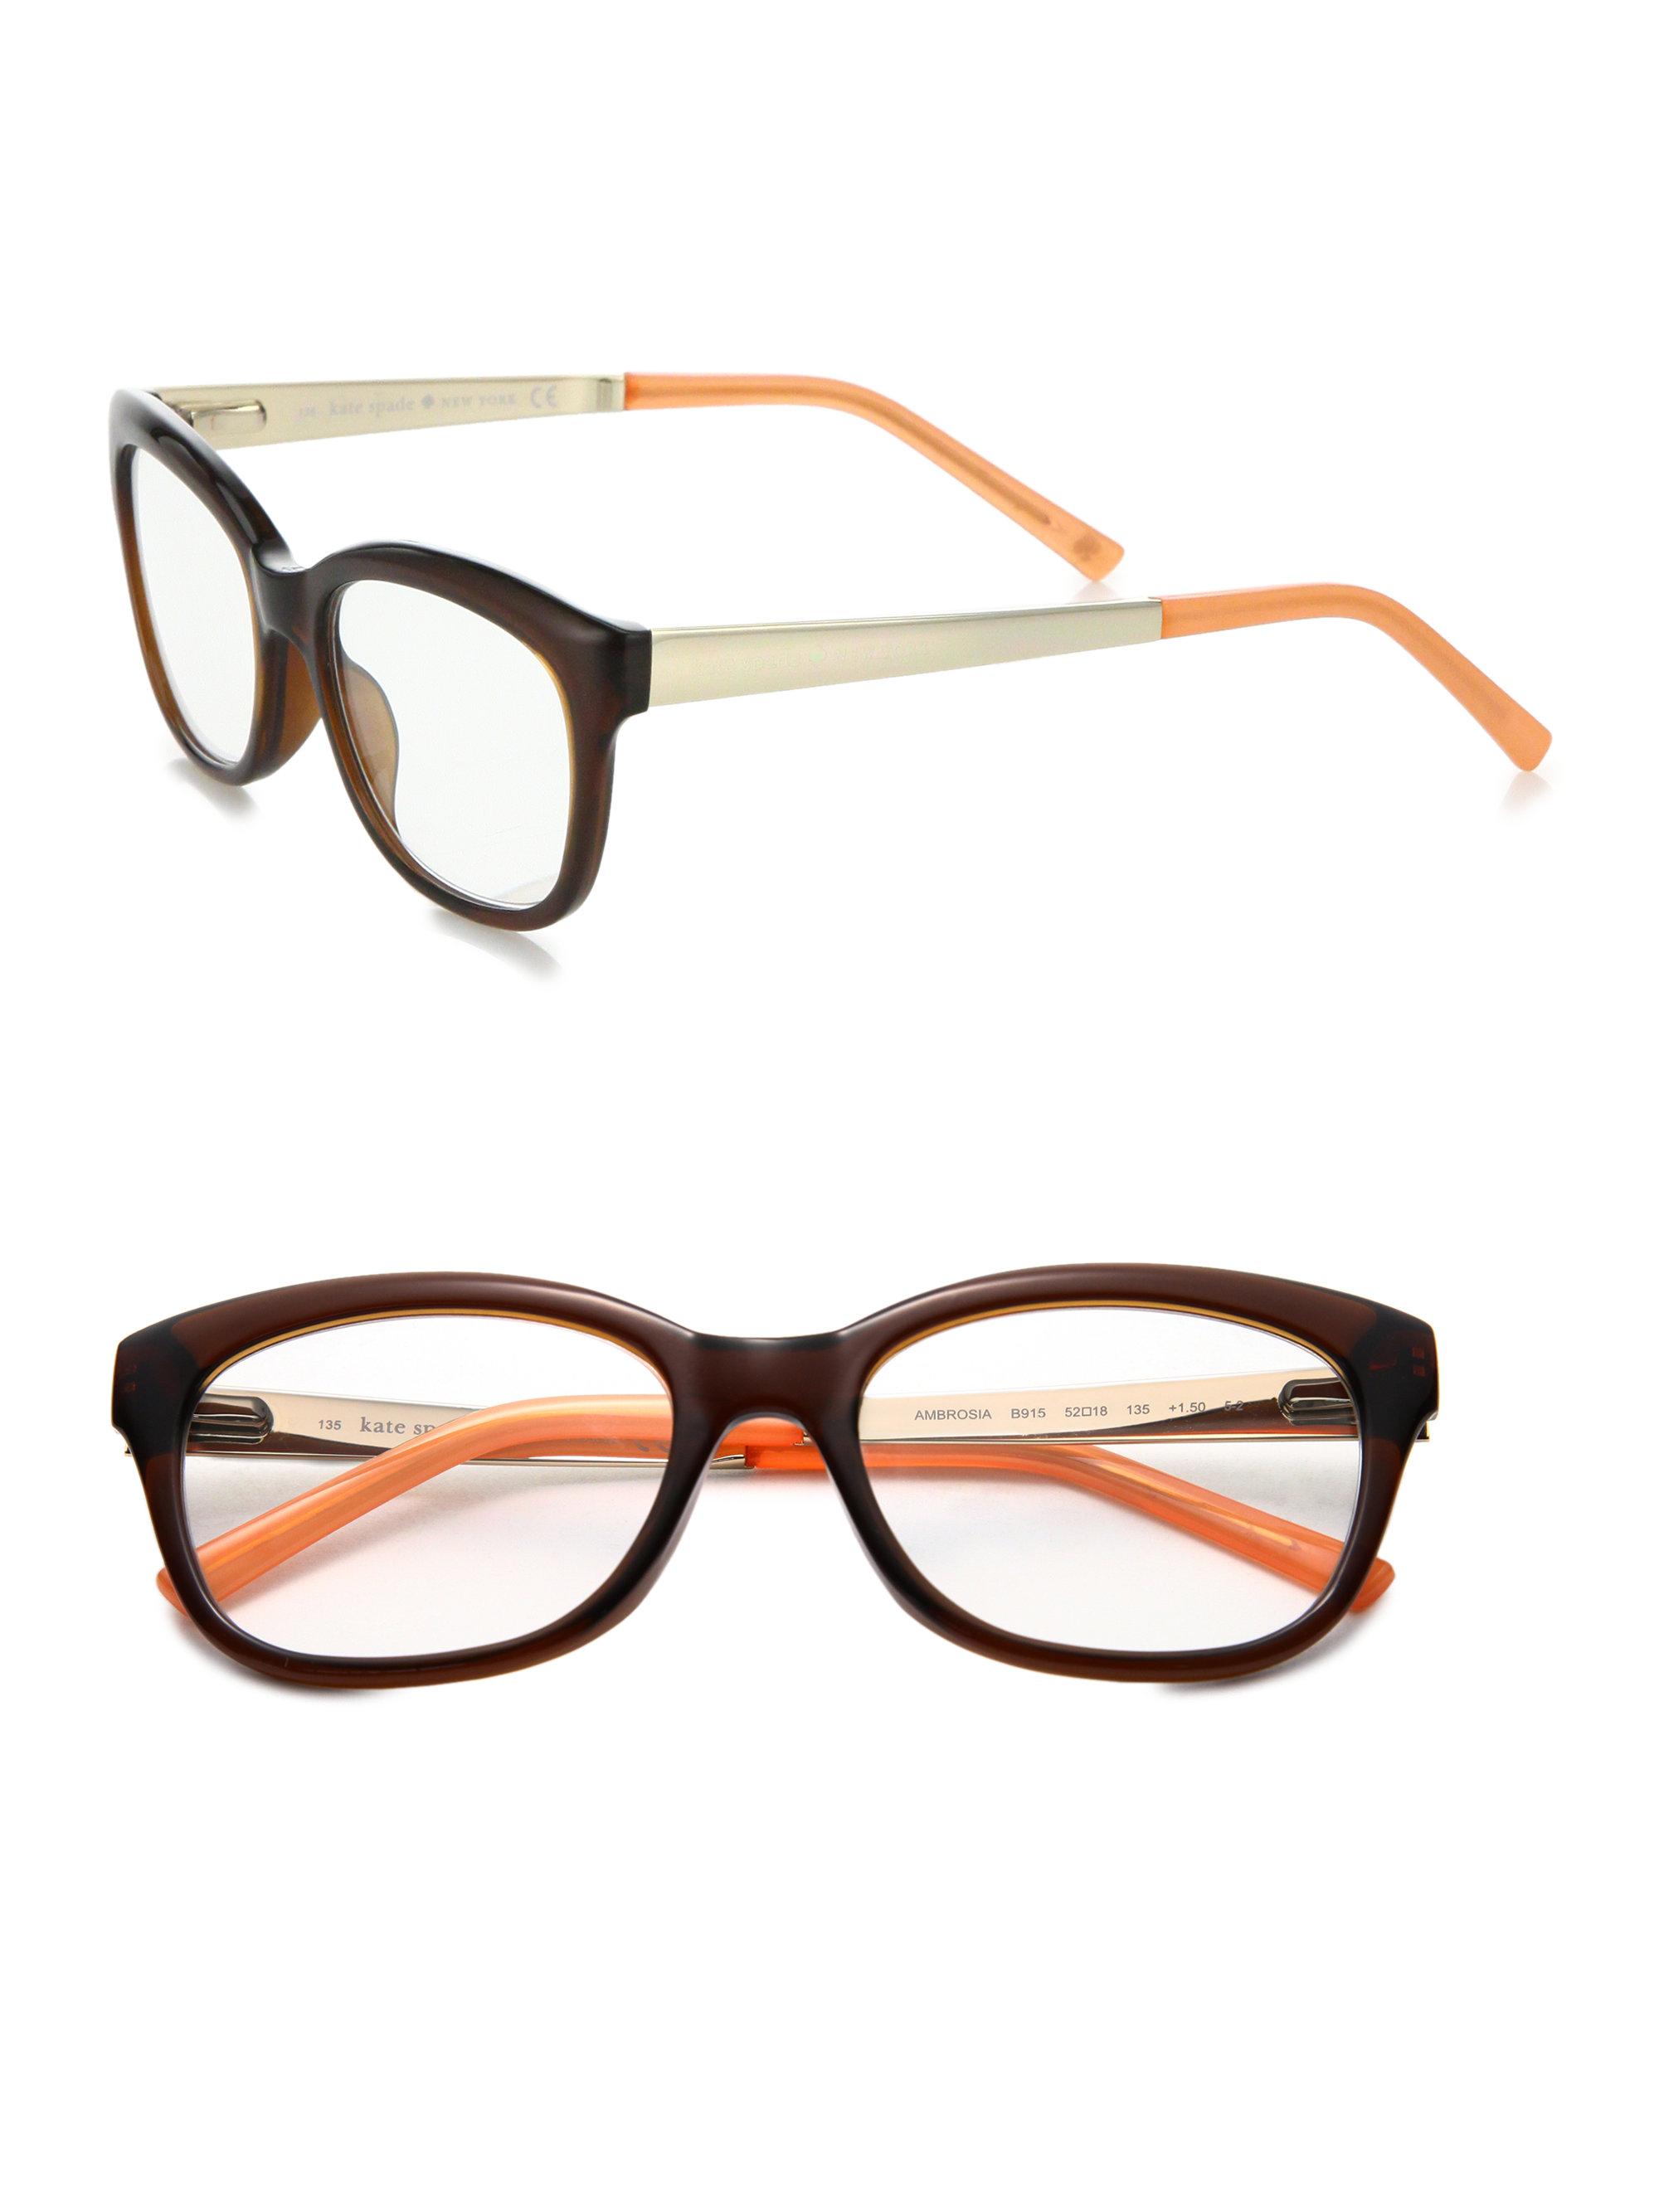 Kate Spade New York Eyeglass Frames : Kate spade new york Ambrose 52mm Optical Glasses in Brown ...